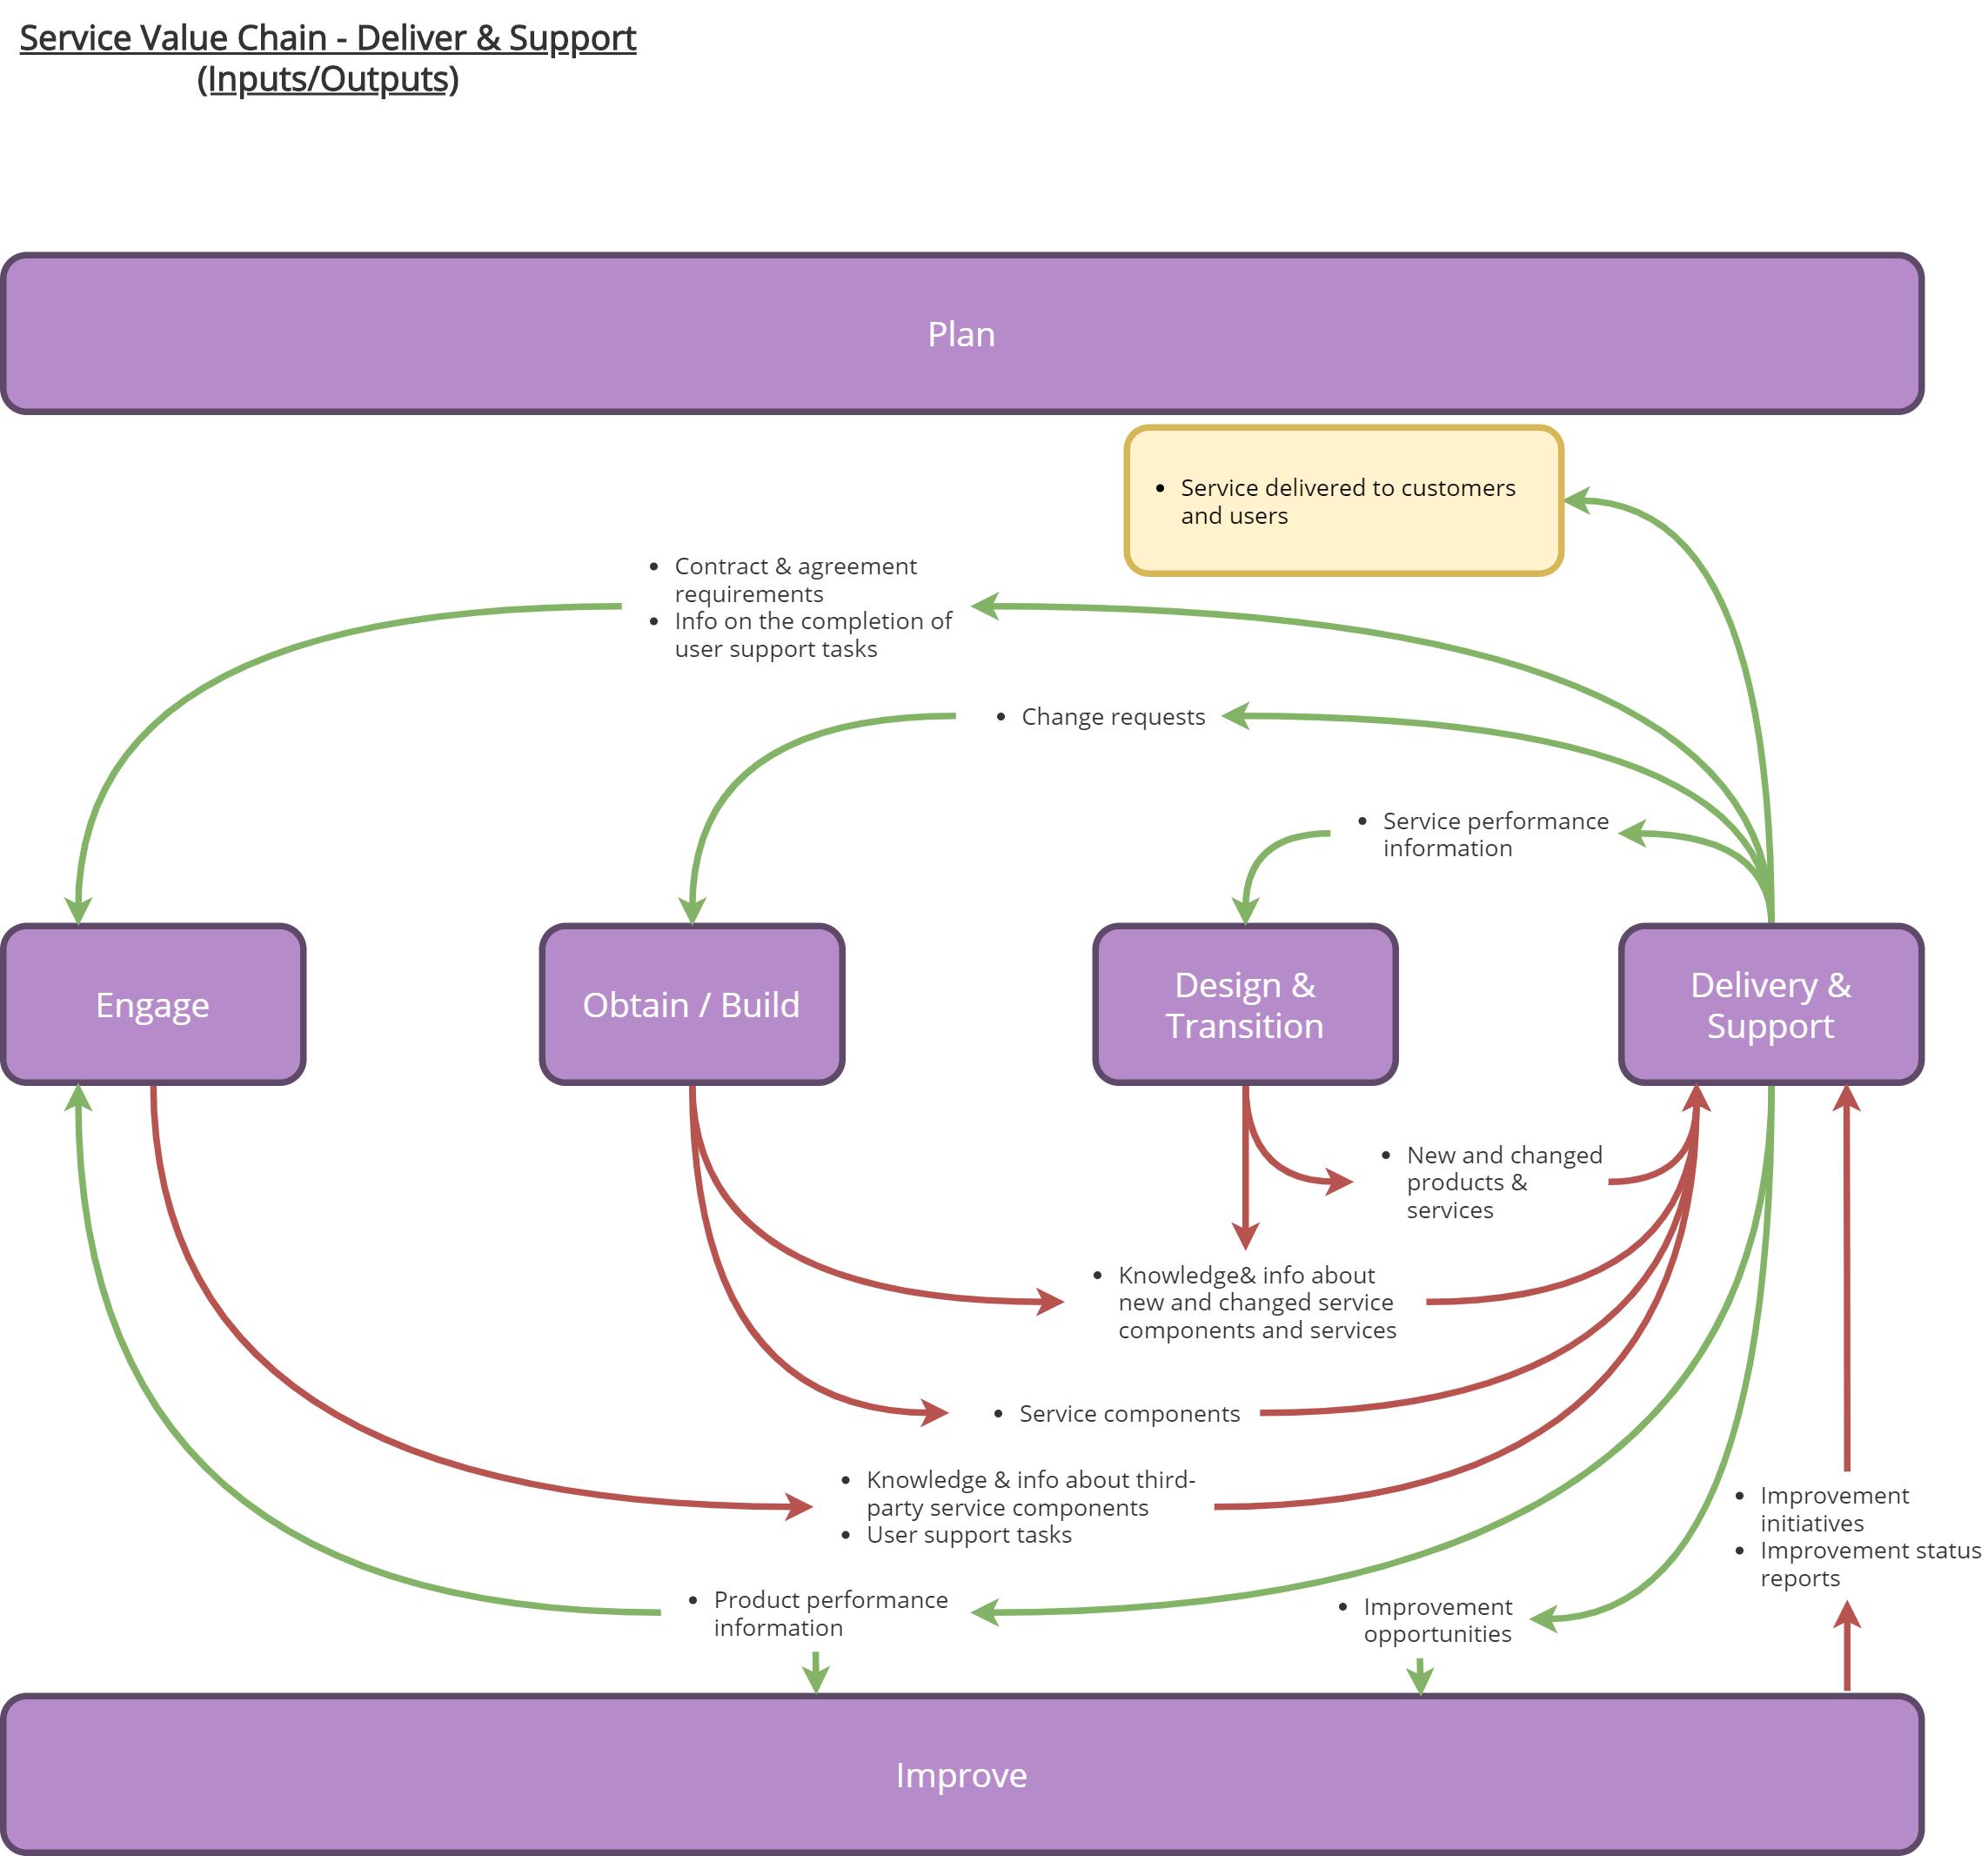 ServiceValueChainDeliverSupport – ITILv4